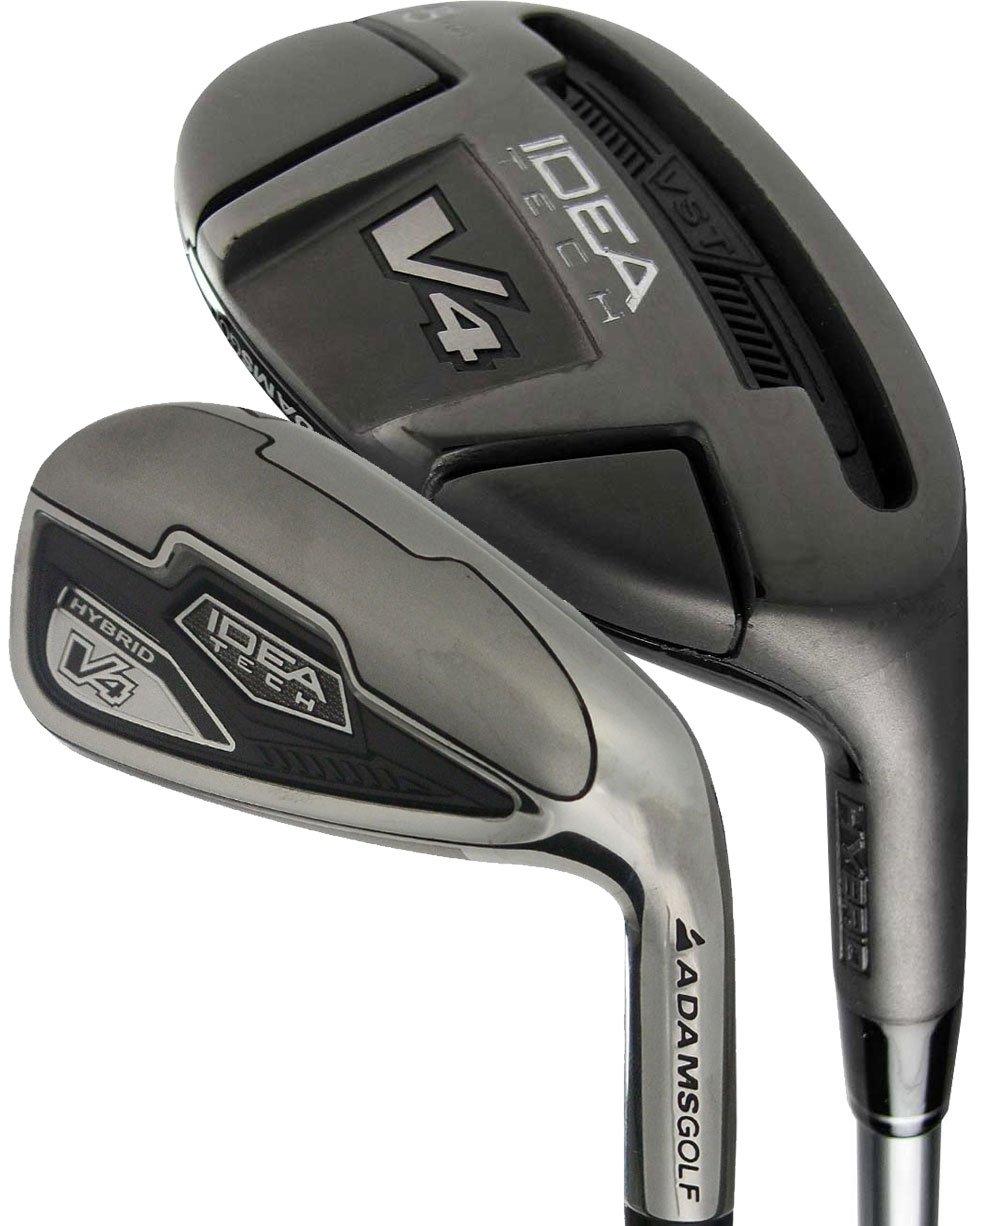 10 Fashionable Adams Golf Idea Tech V4 adams idea tech v4 0 hybrid irons graphite steeladams golf 1 2020